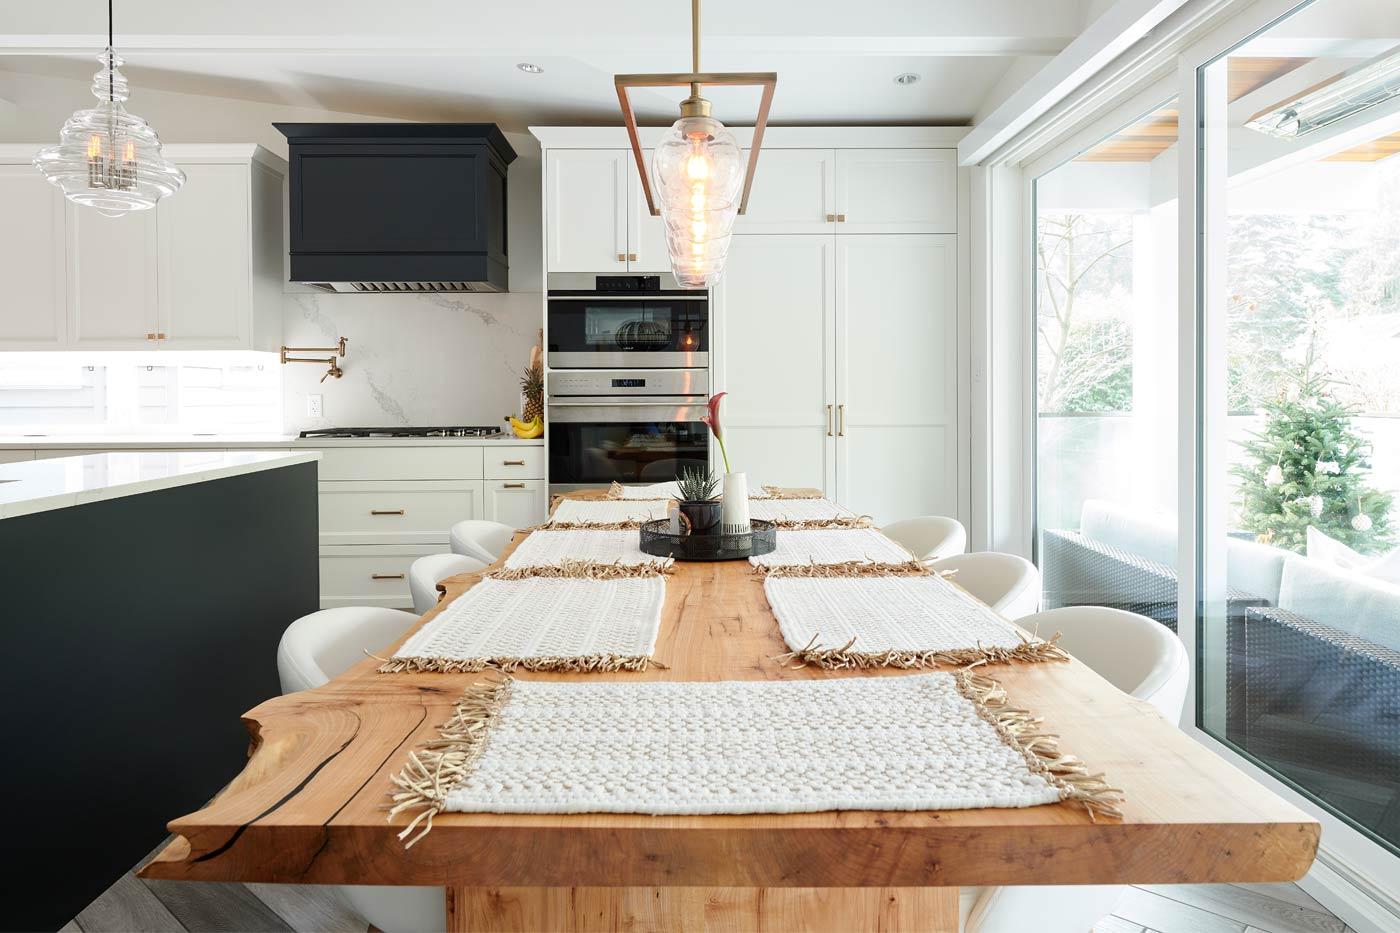 Kitchen Reno - North Shore Vancouver